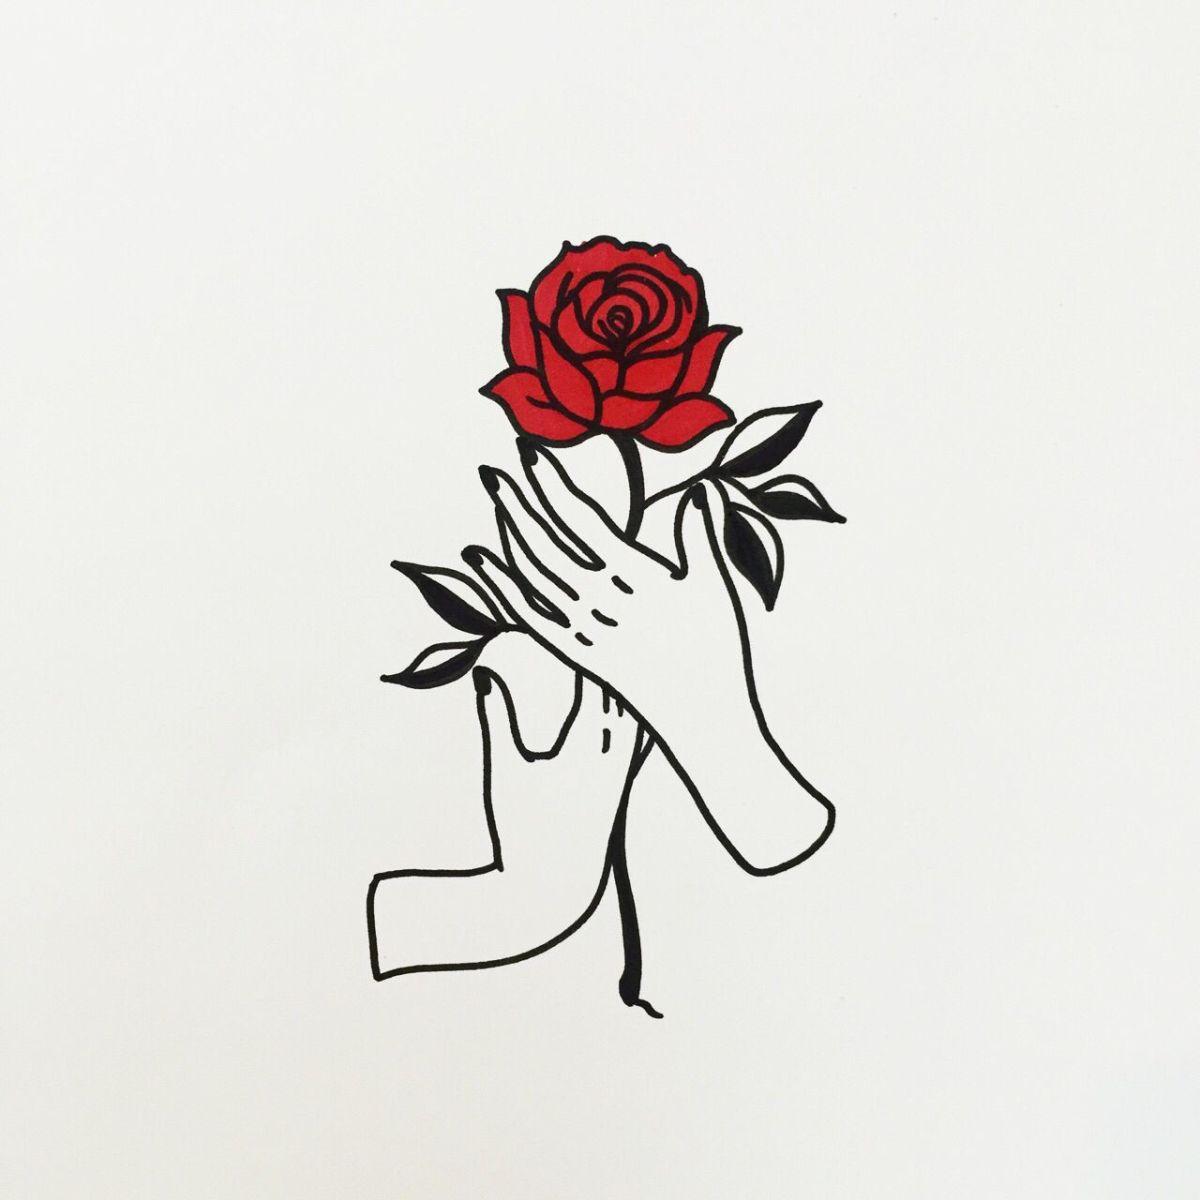 Illustration by Matilda Lee via Pinterest